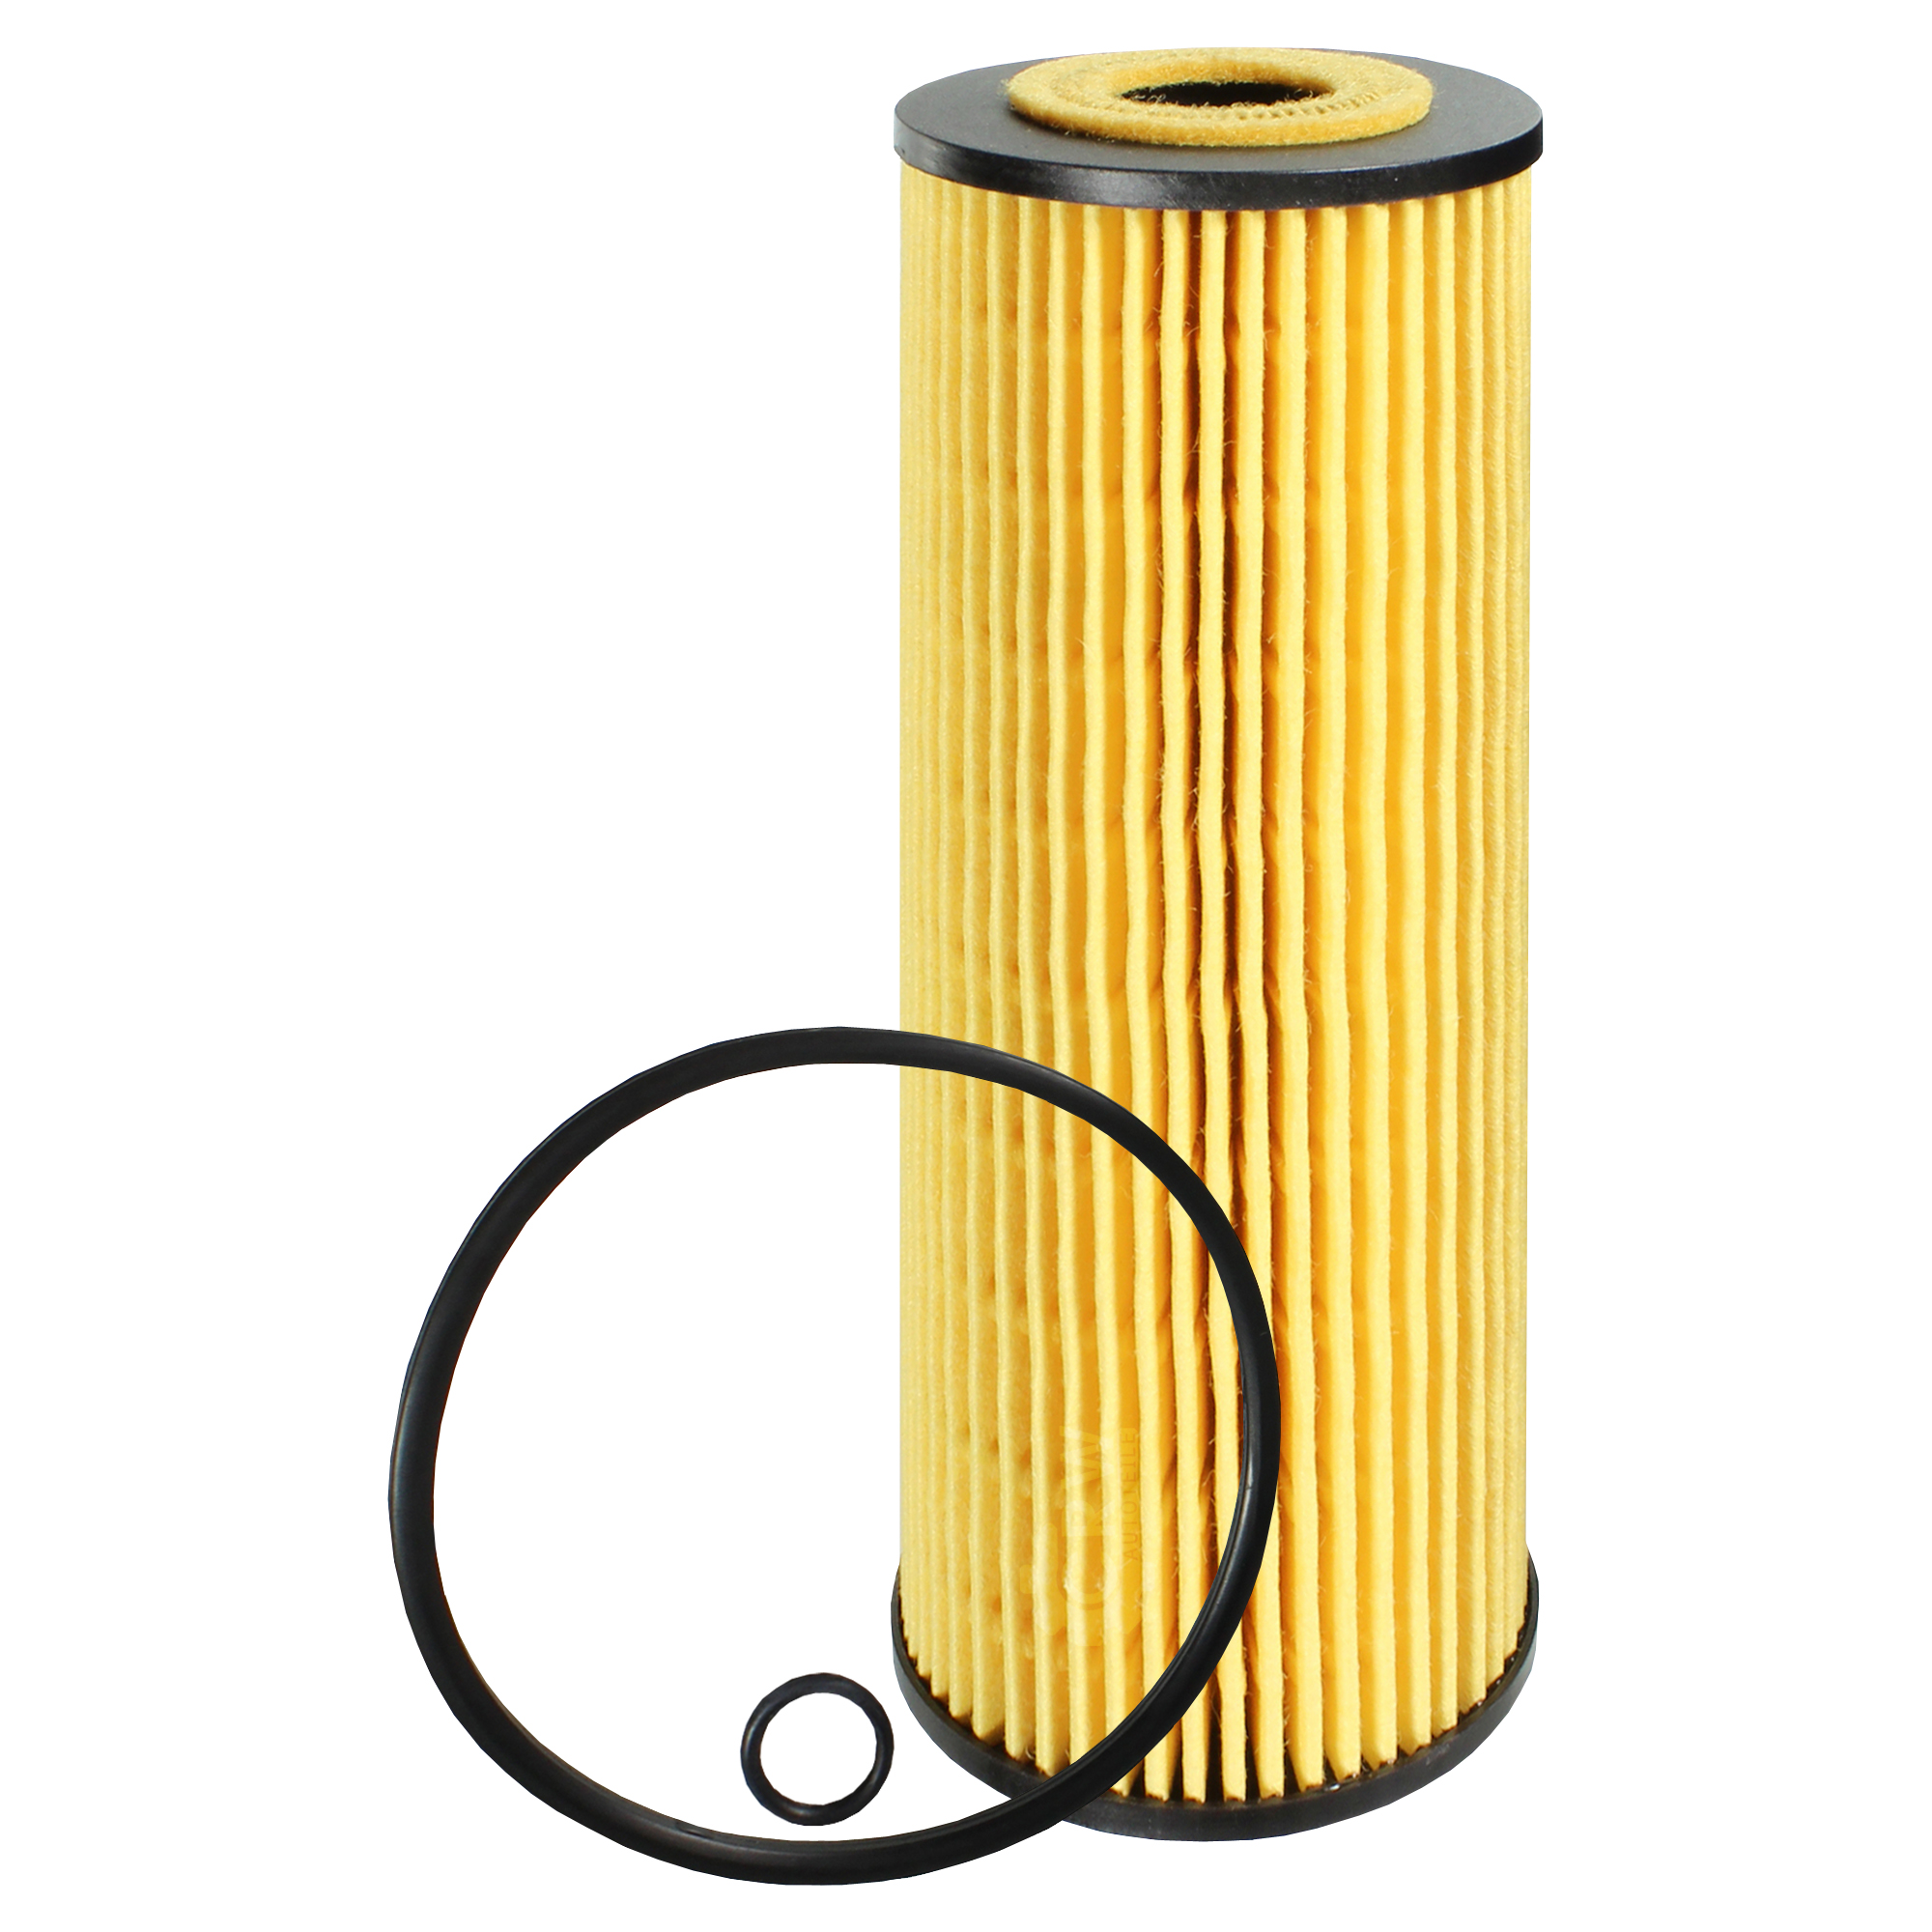 Cambio-de-aceite-set-5l-MANNOL-energy-premium-5w-30-sct-filtro-aceite-Service-10164411 miniatura 6